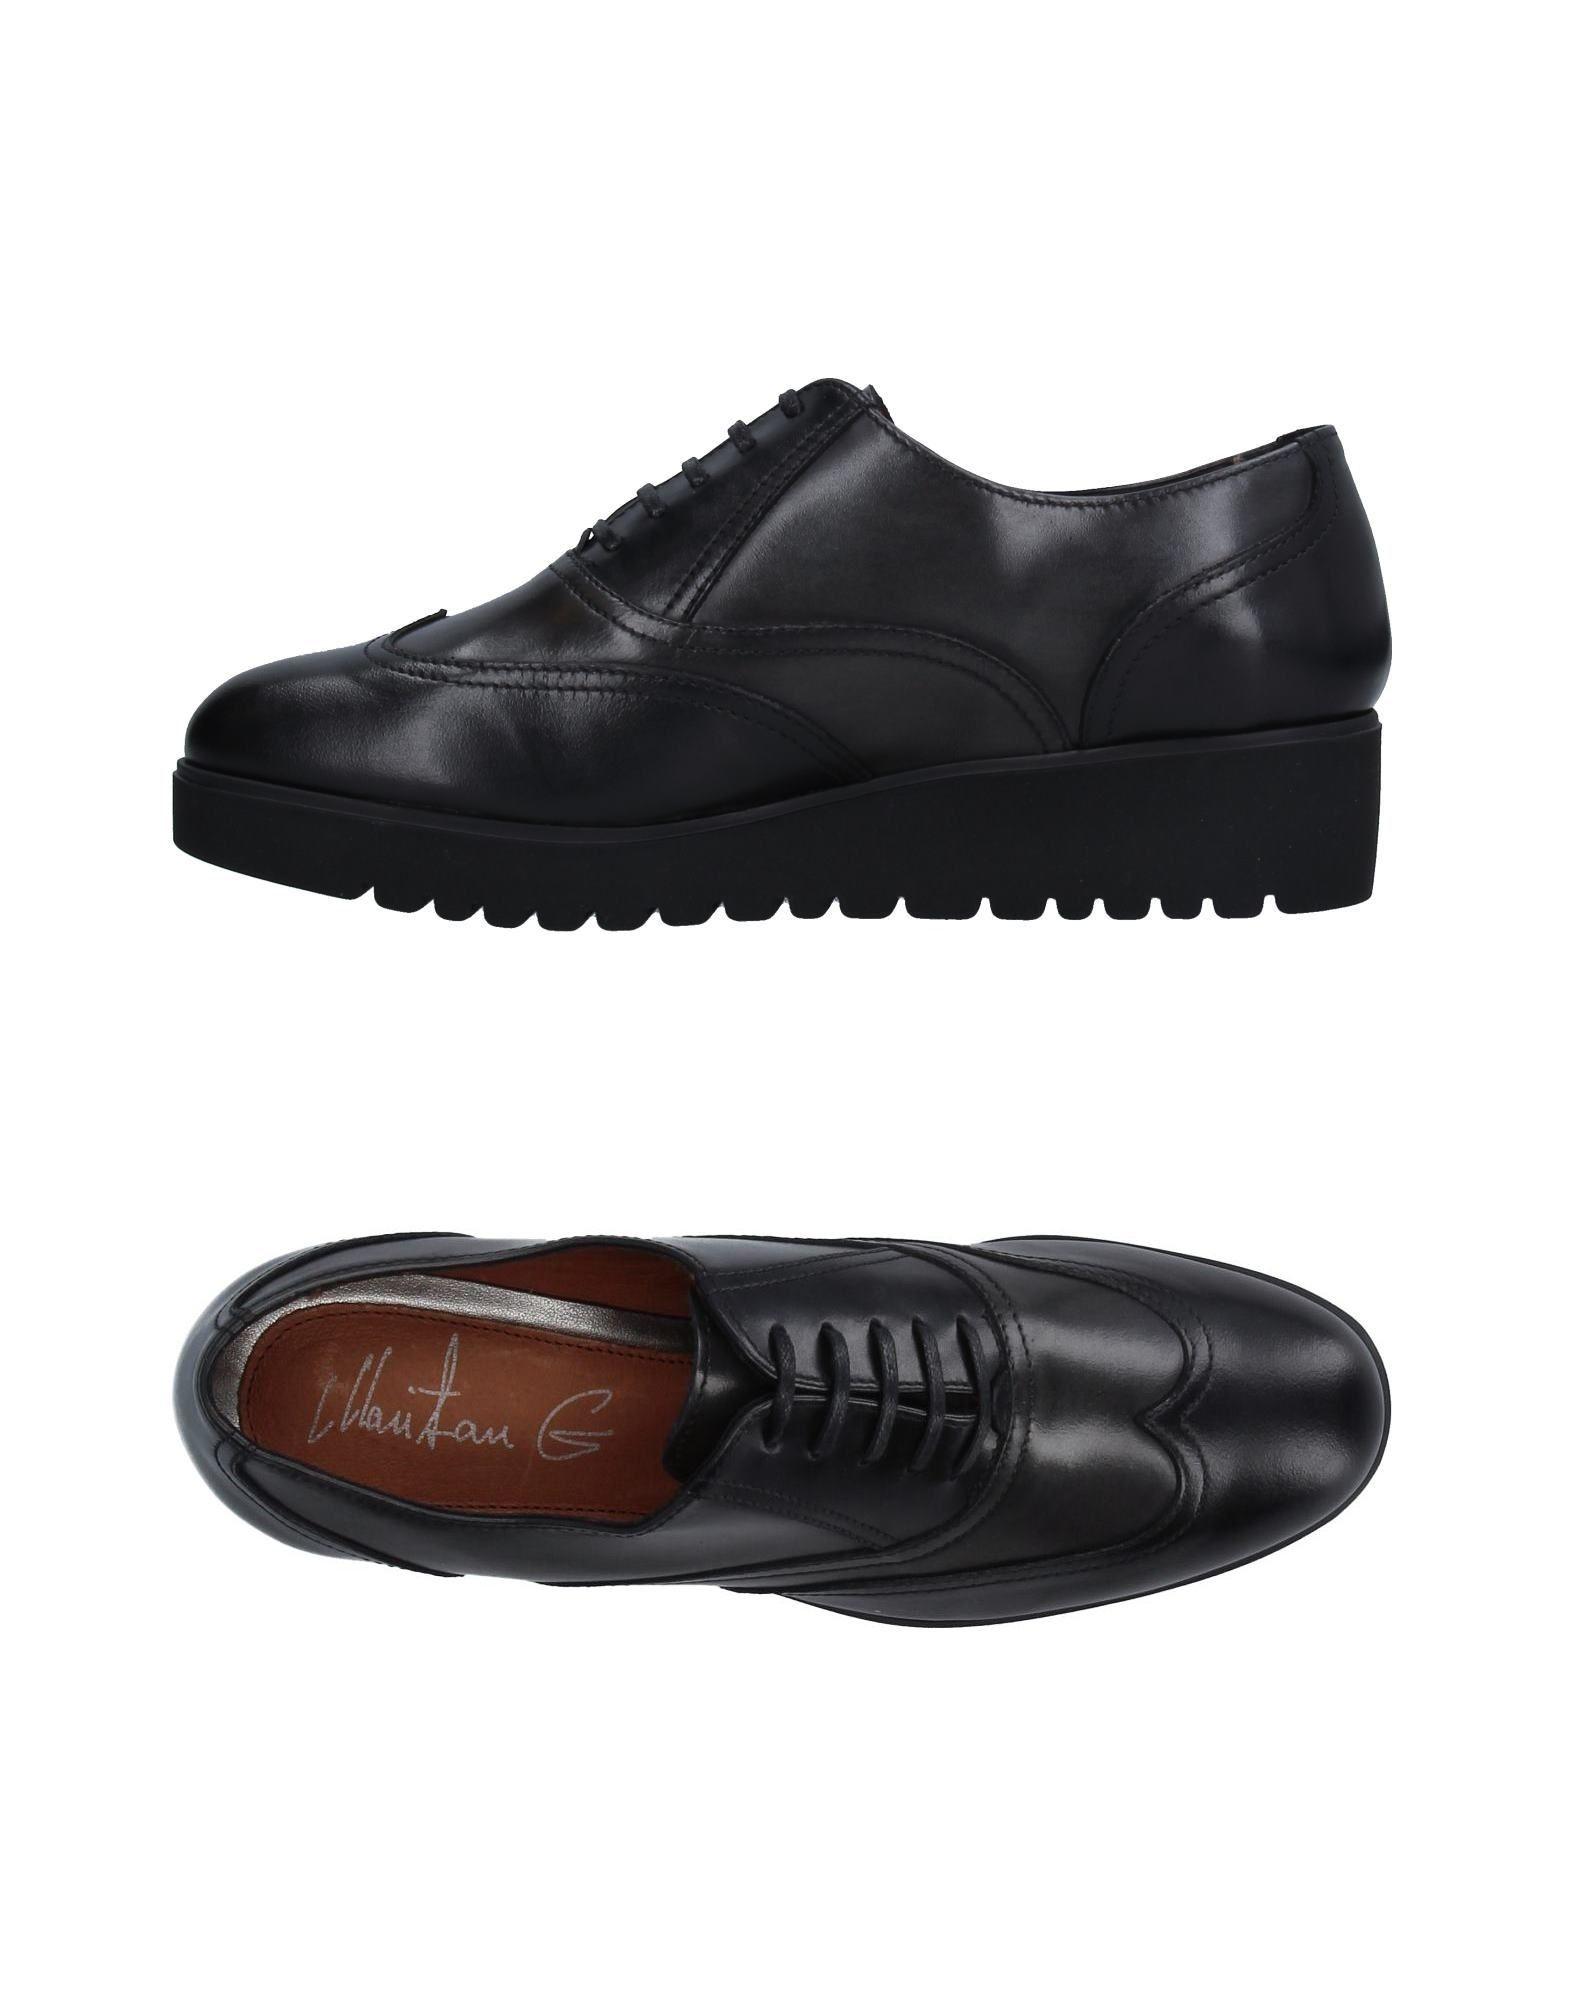 Marco Ferretti Shoes Mens